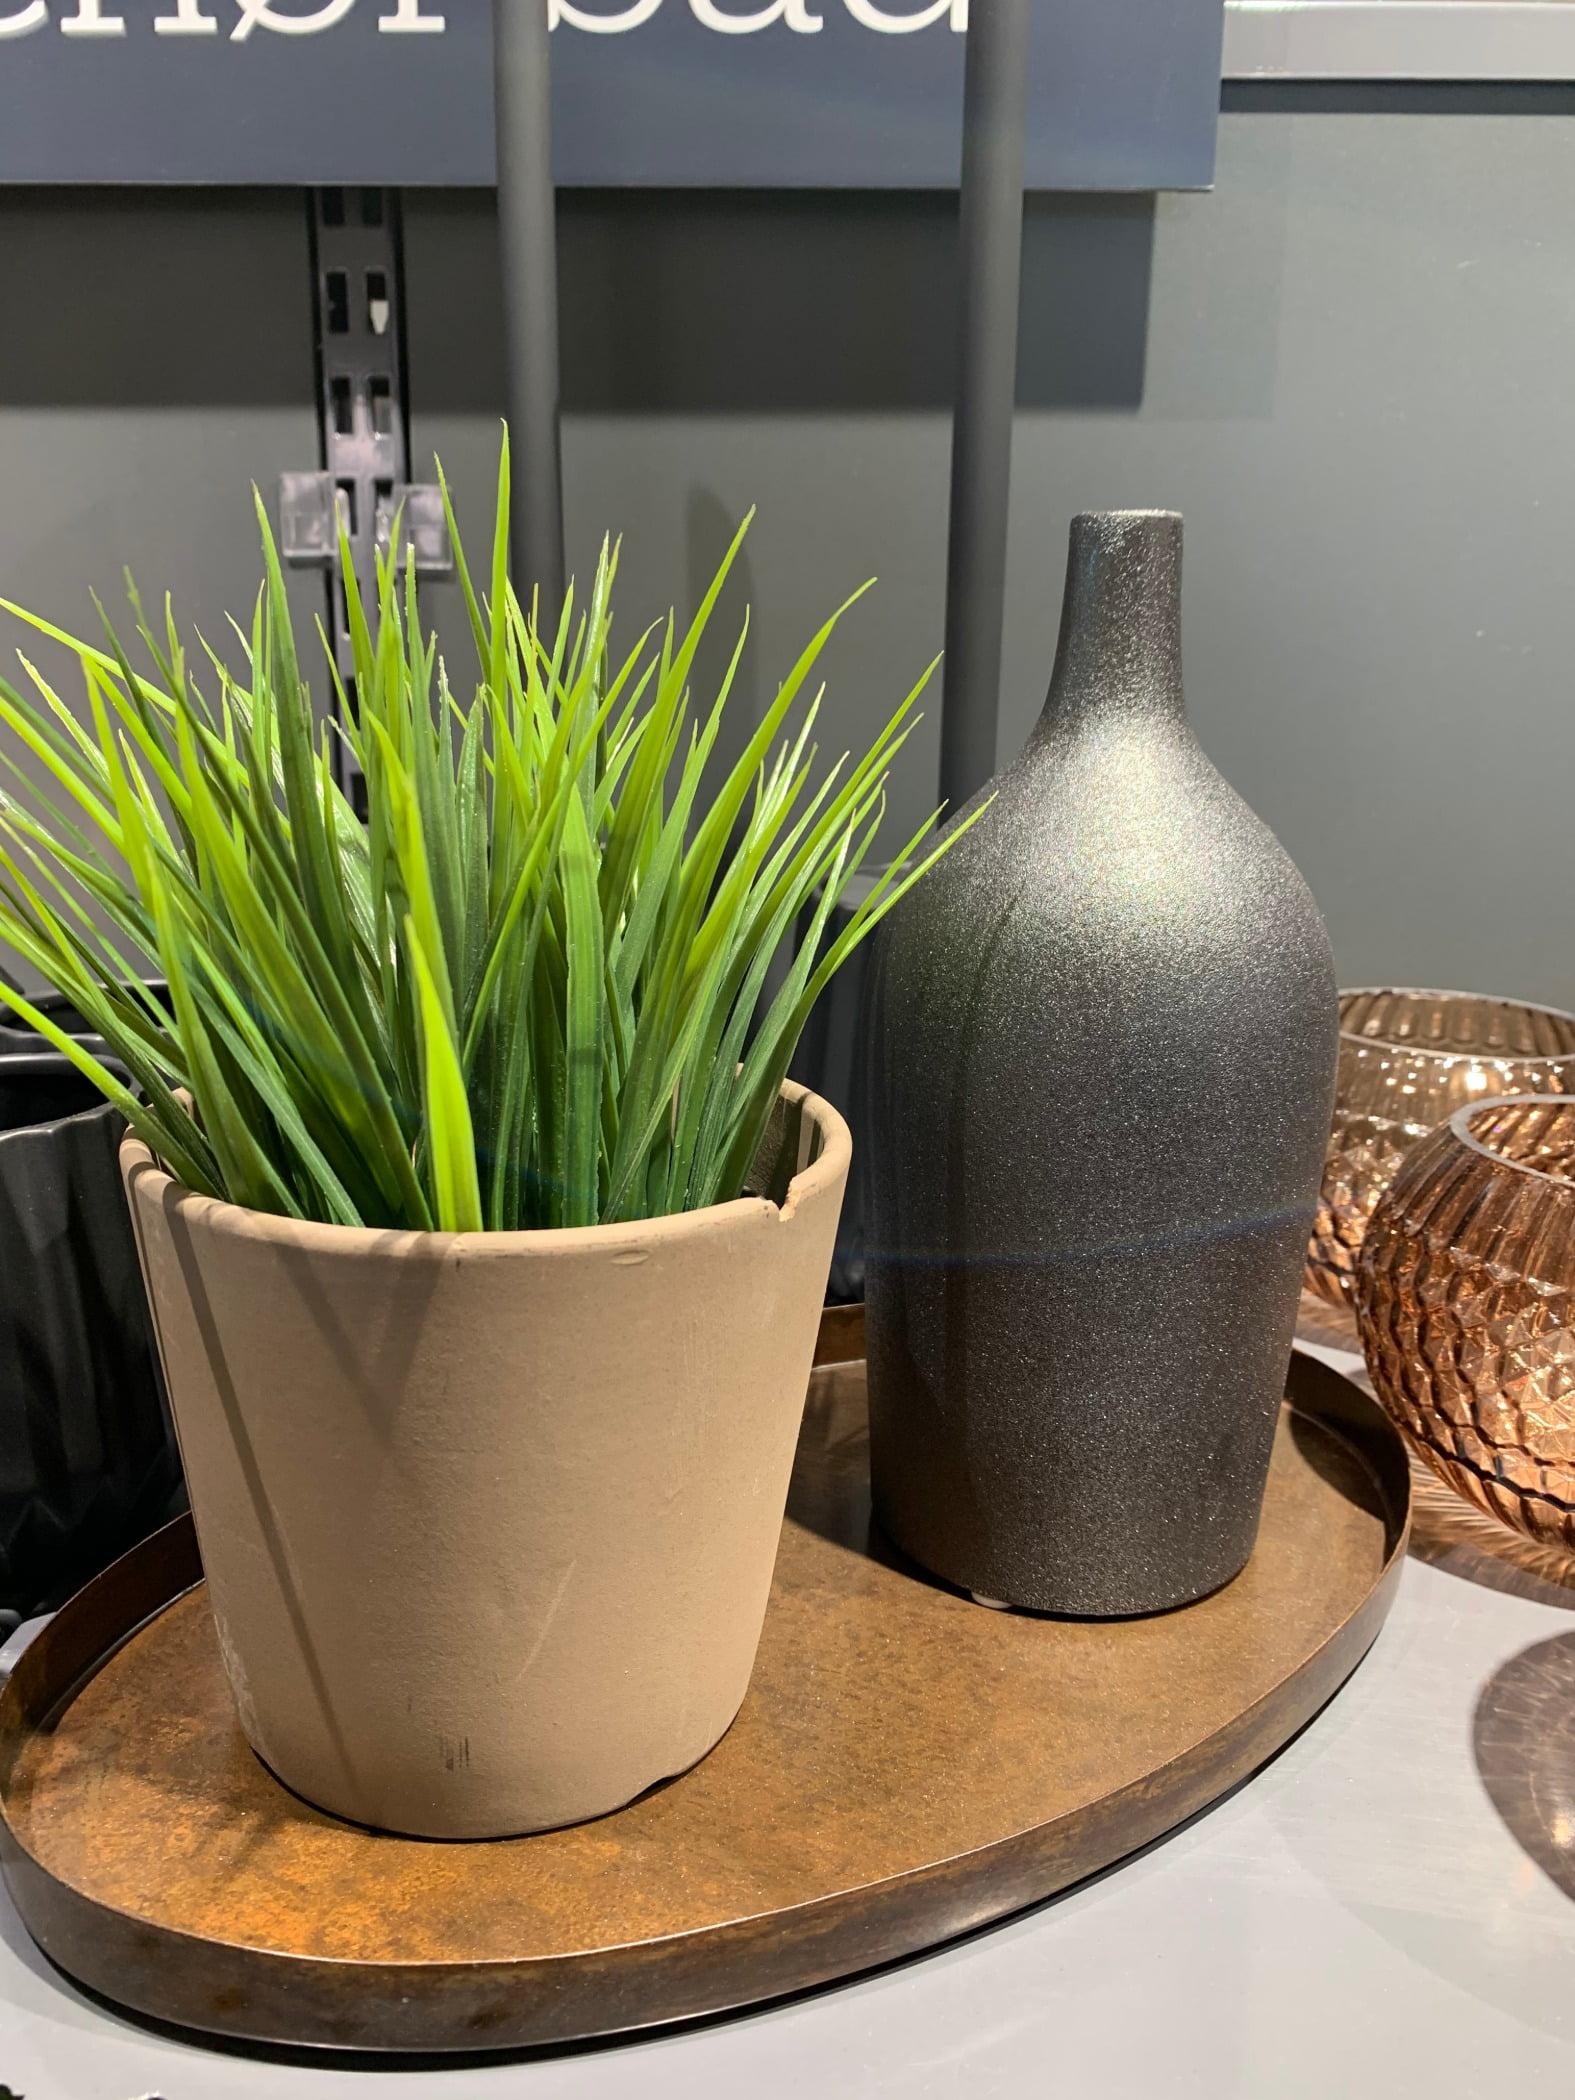 Interior design, Plant, Flowerpot, Houseplant, Serveware, Wood, Dishware, Pottery